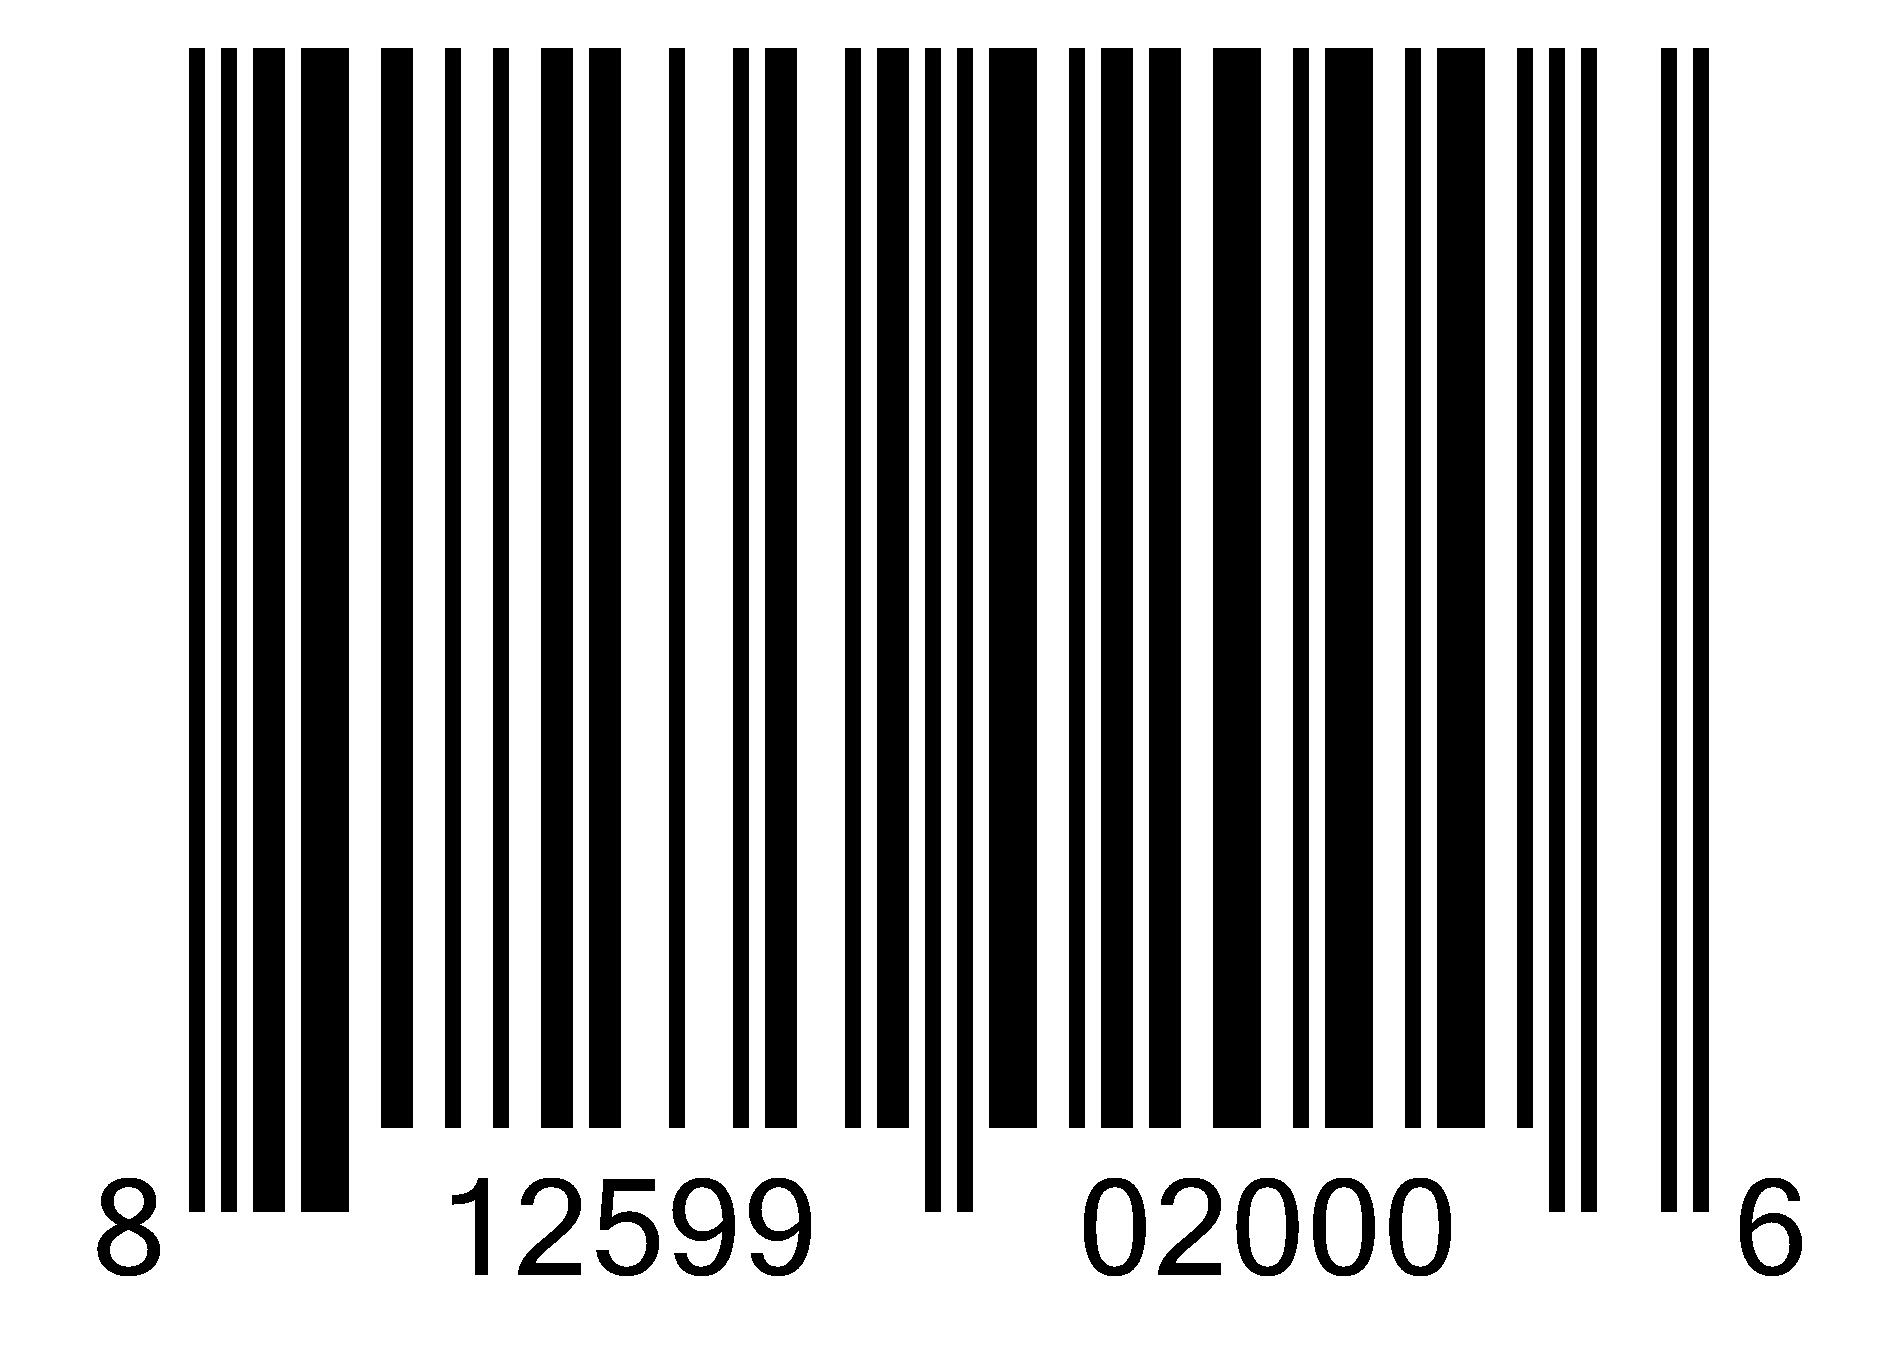 BV2 00812599020006 UPC-A SST1